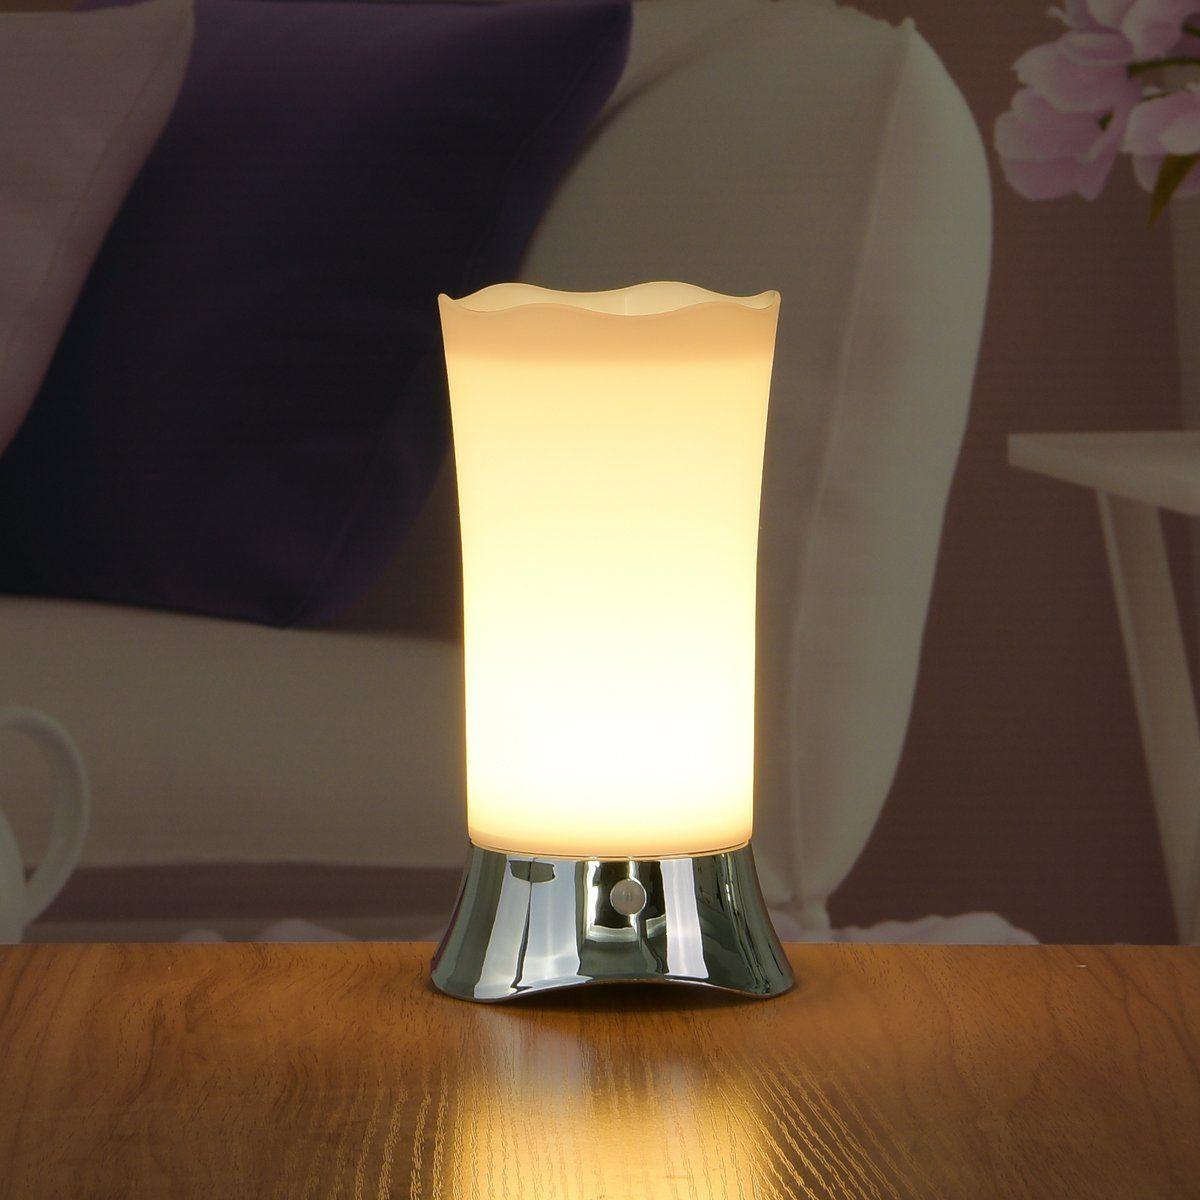 ZEEFO Table Lamps Indoor Motion Sensor LED Night Light - Portable ...